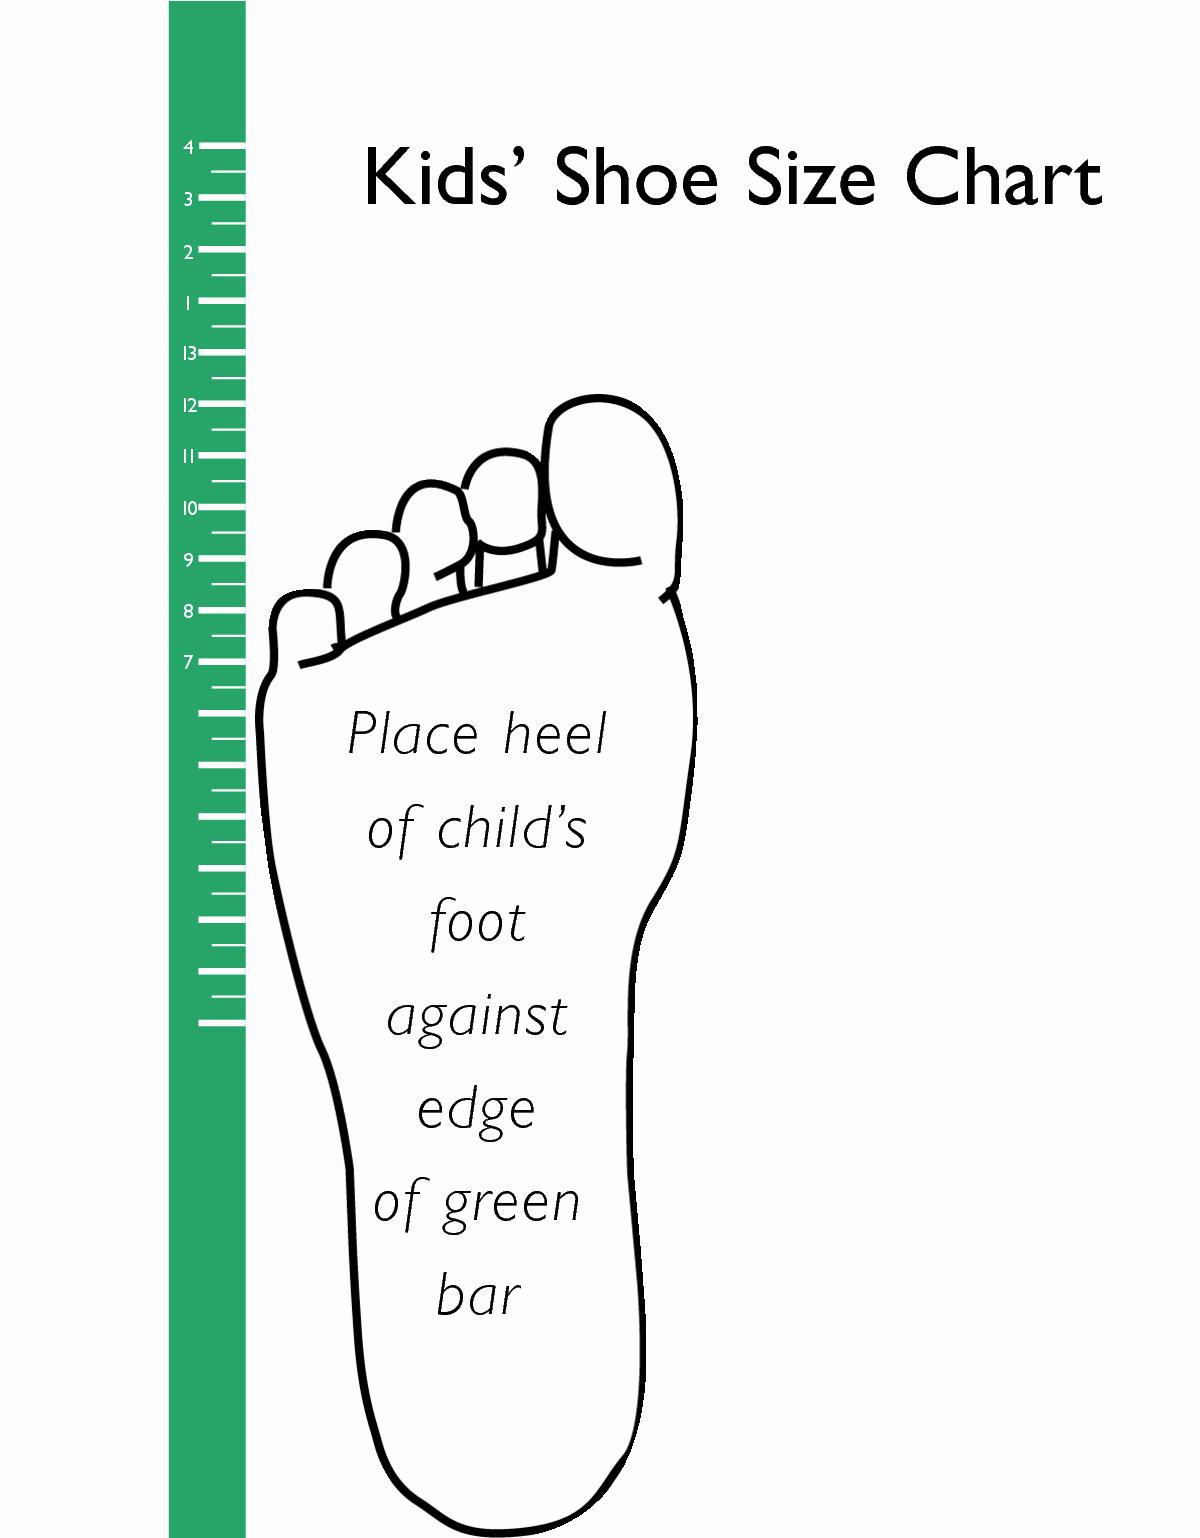 Clothing Size Chart Template Beautiful Printable Kids Shoe Size Chart